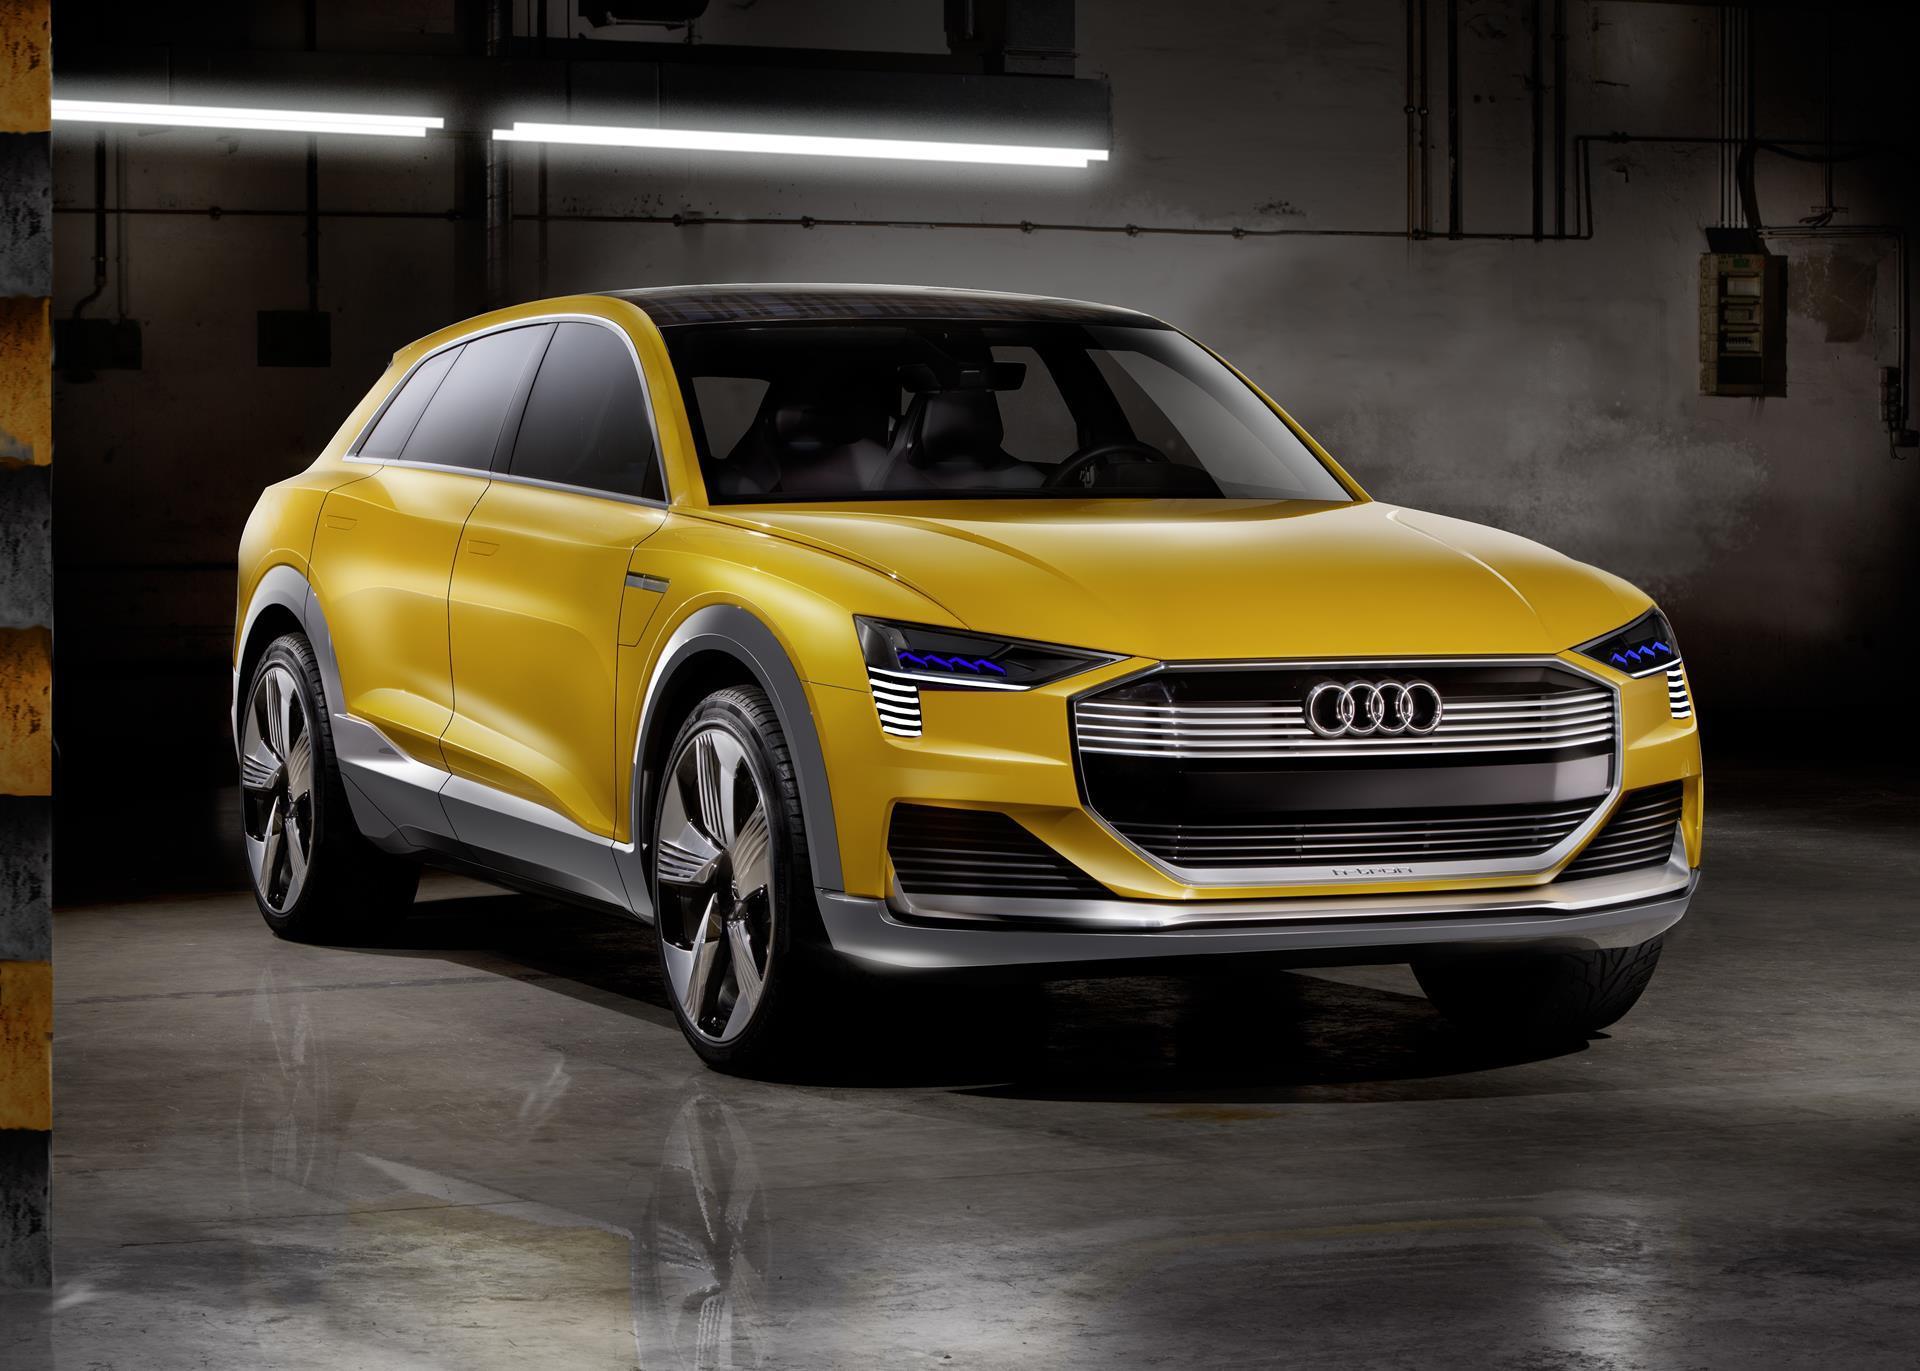 2016 Audi H-tron Quattro Concept News And Information